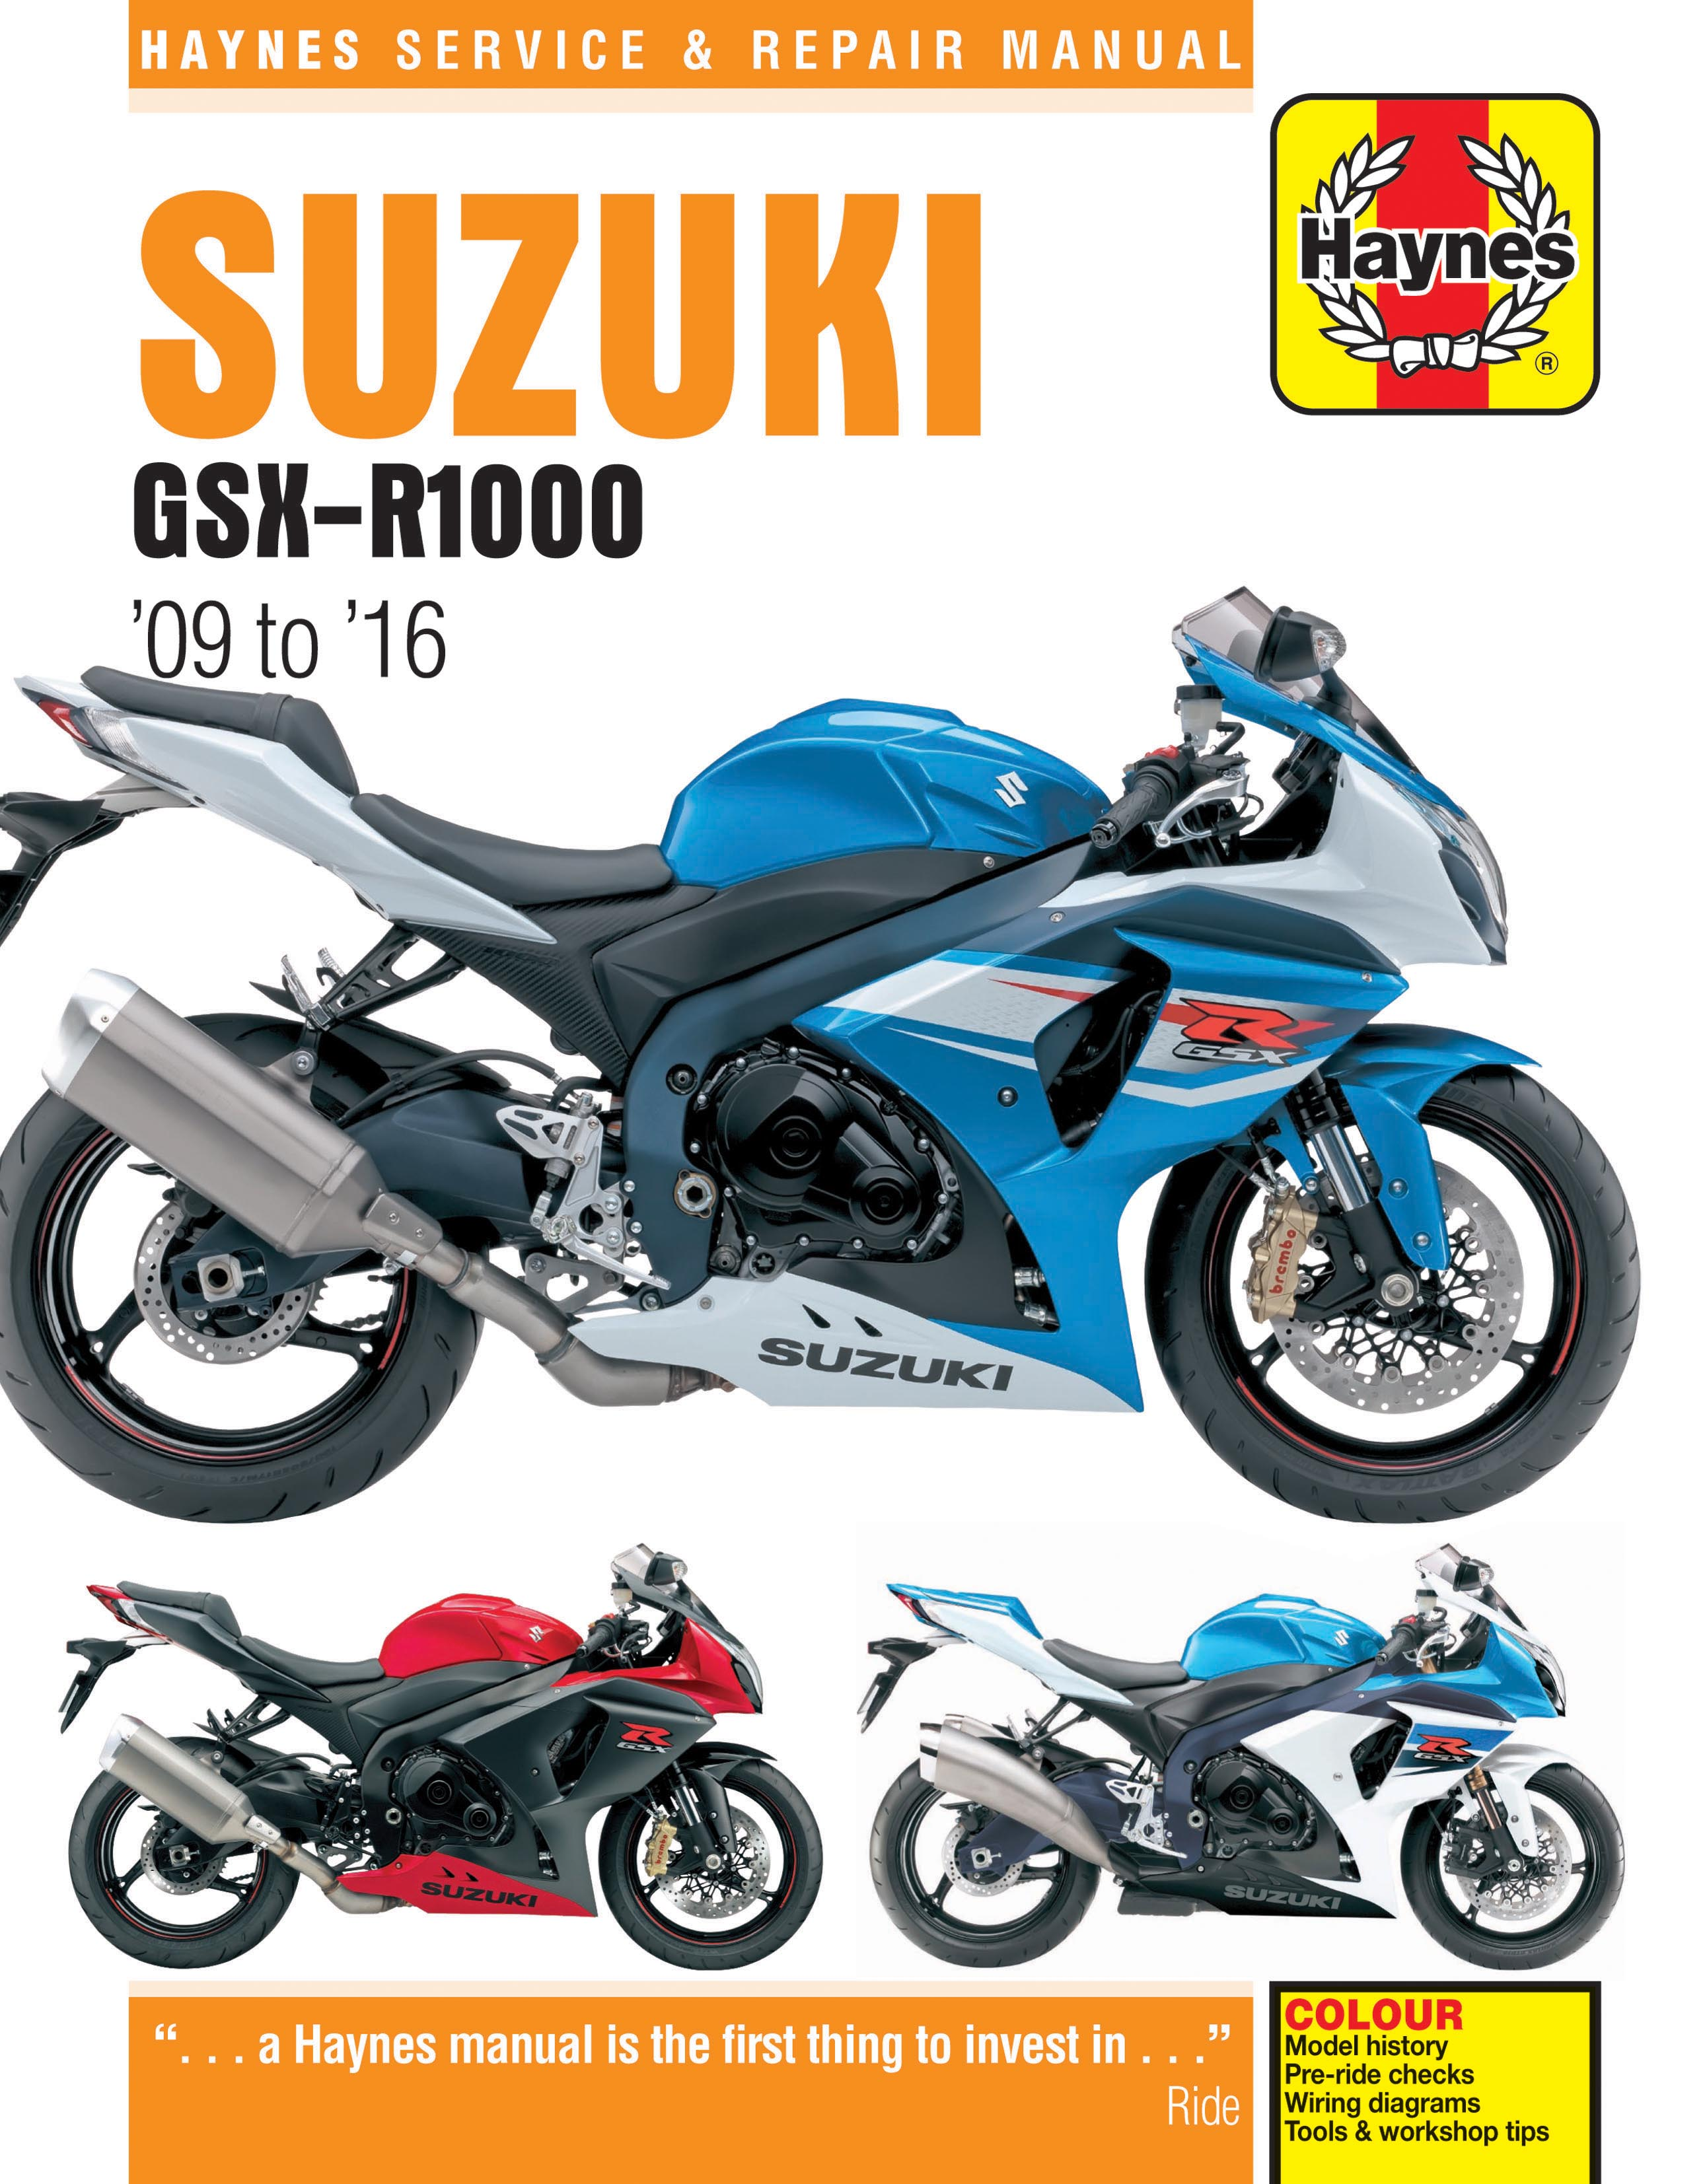 Suzuki GSX-R1000 (09-16) Haynes Repair Manual